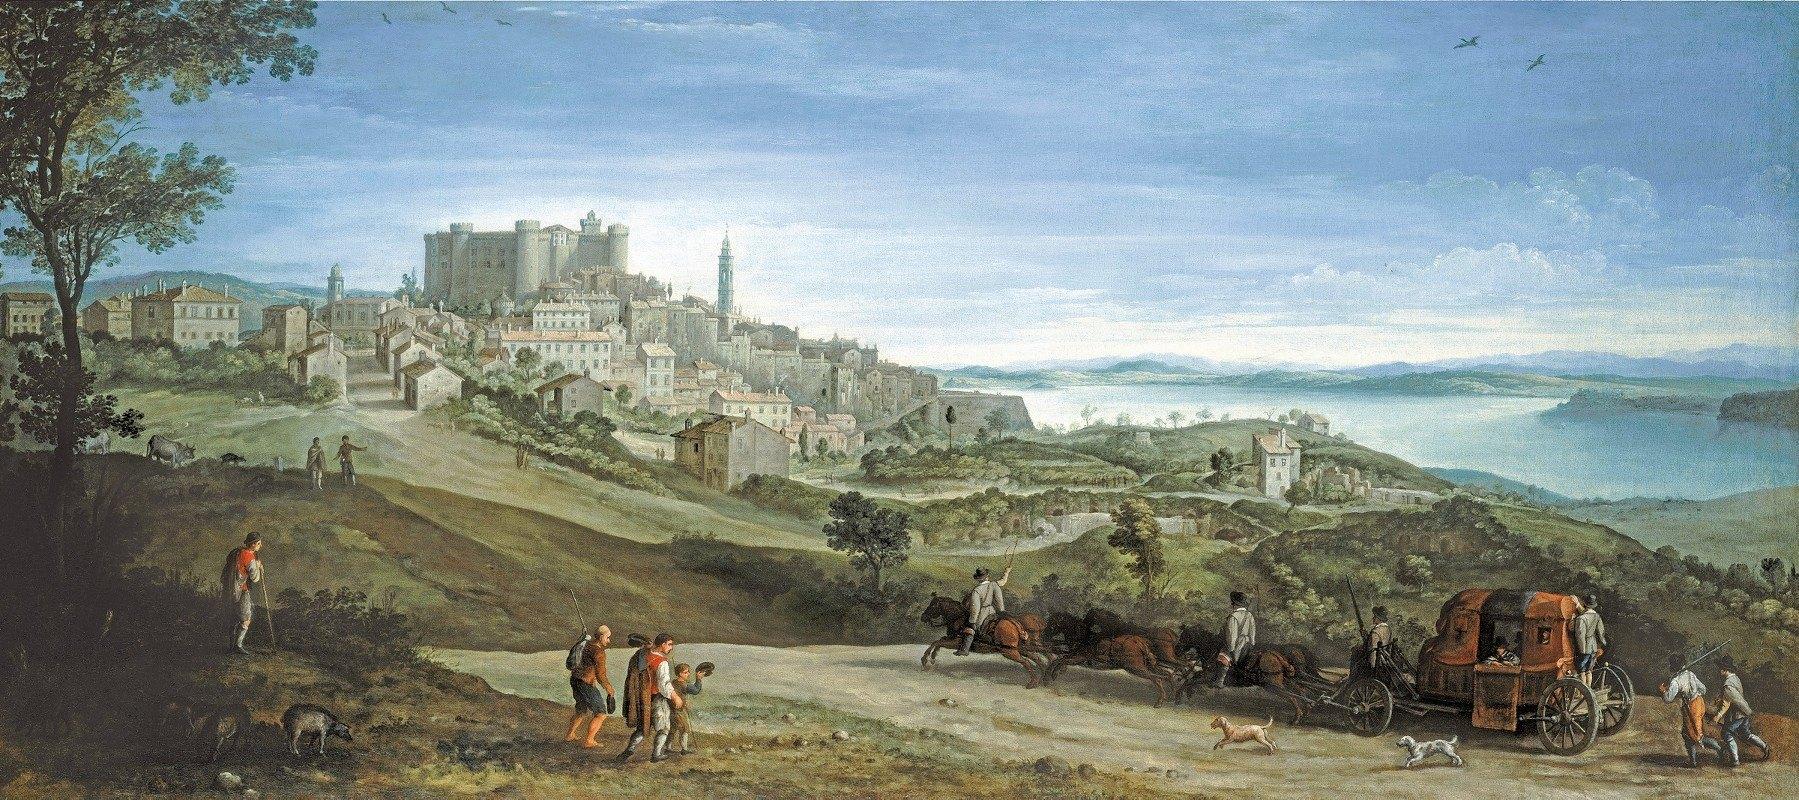 Paul Bril - View of Bracciano